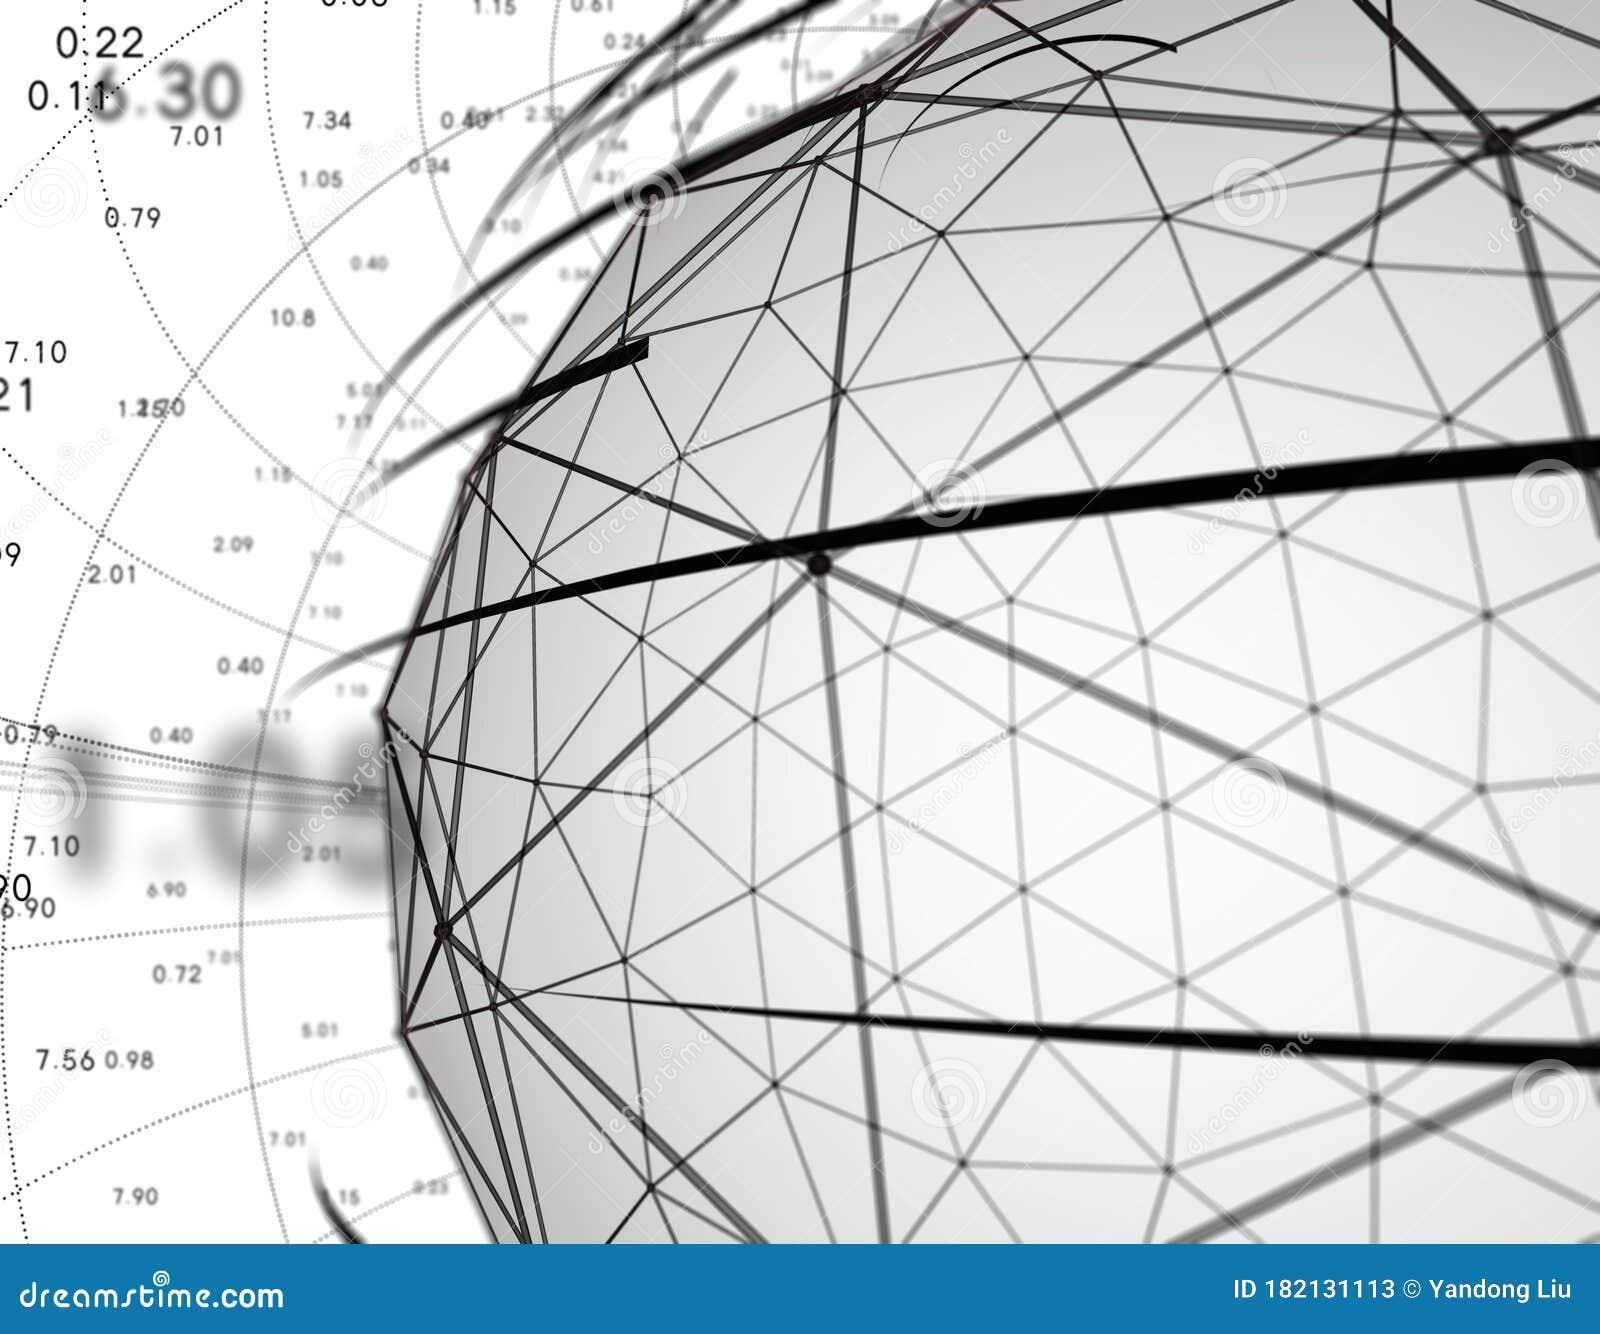 Smart Technology Planet And Data Transmission Global Internet Digital Interaction Data Storage And Link Stock Illustration Illustration Of Internet Financial 182131113